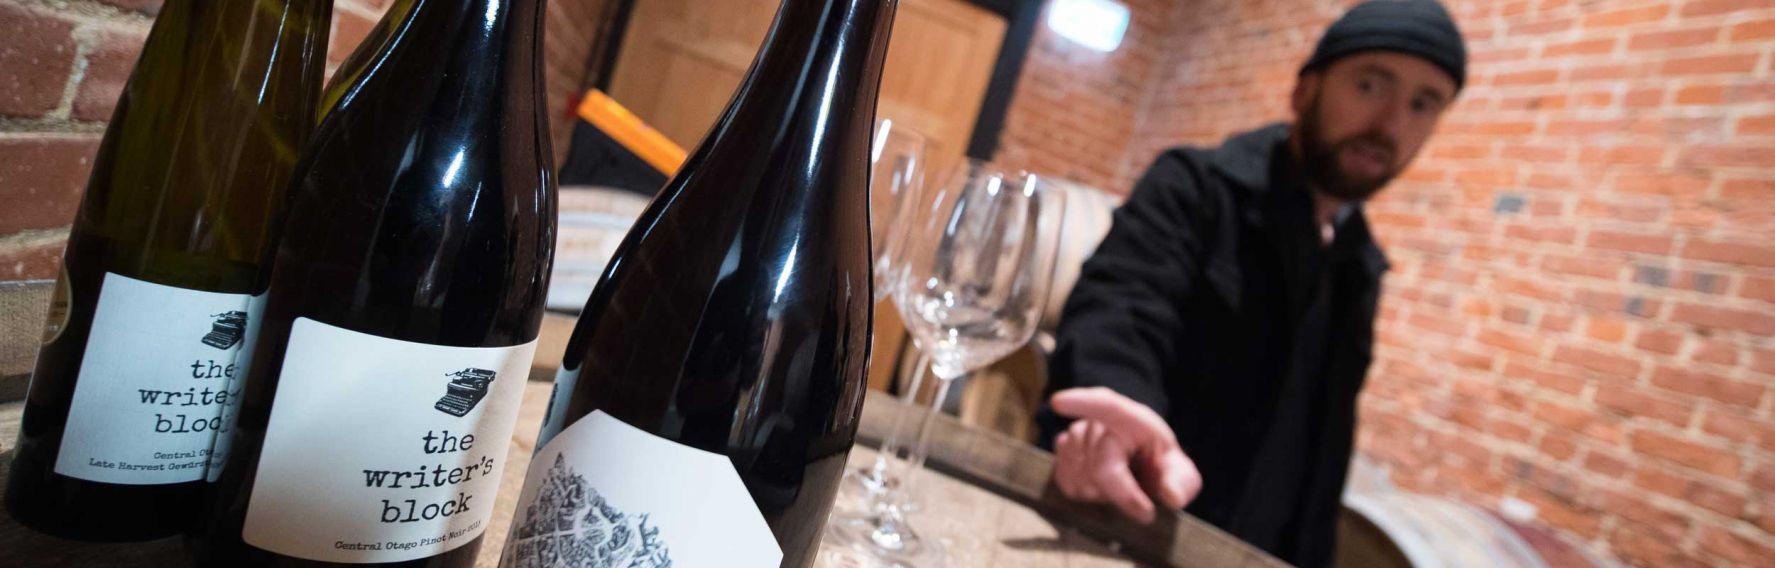 Urbn Vino